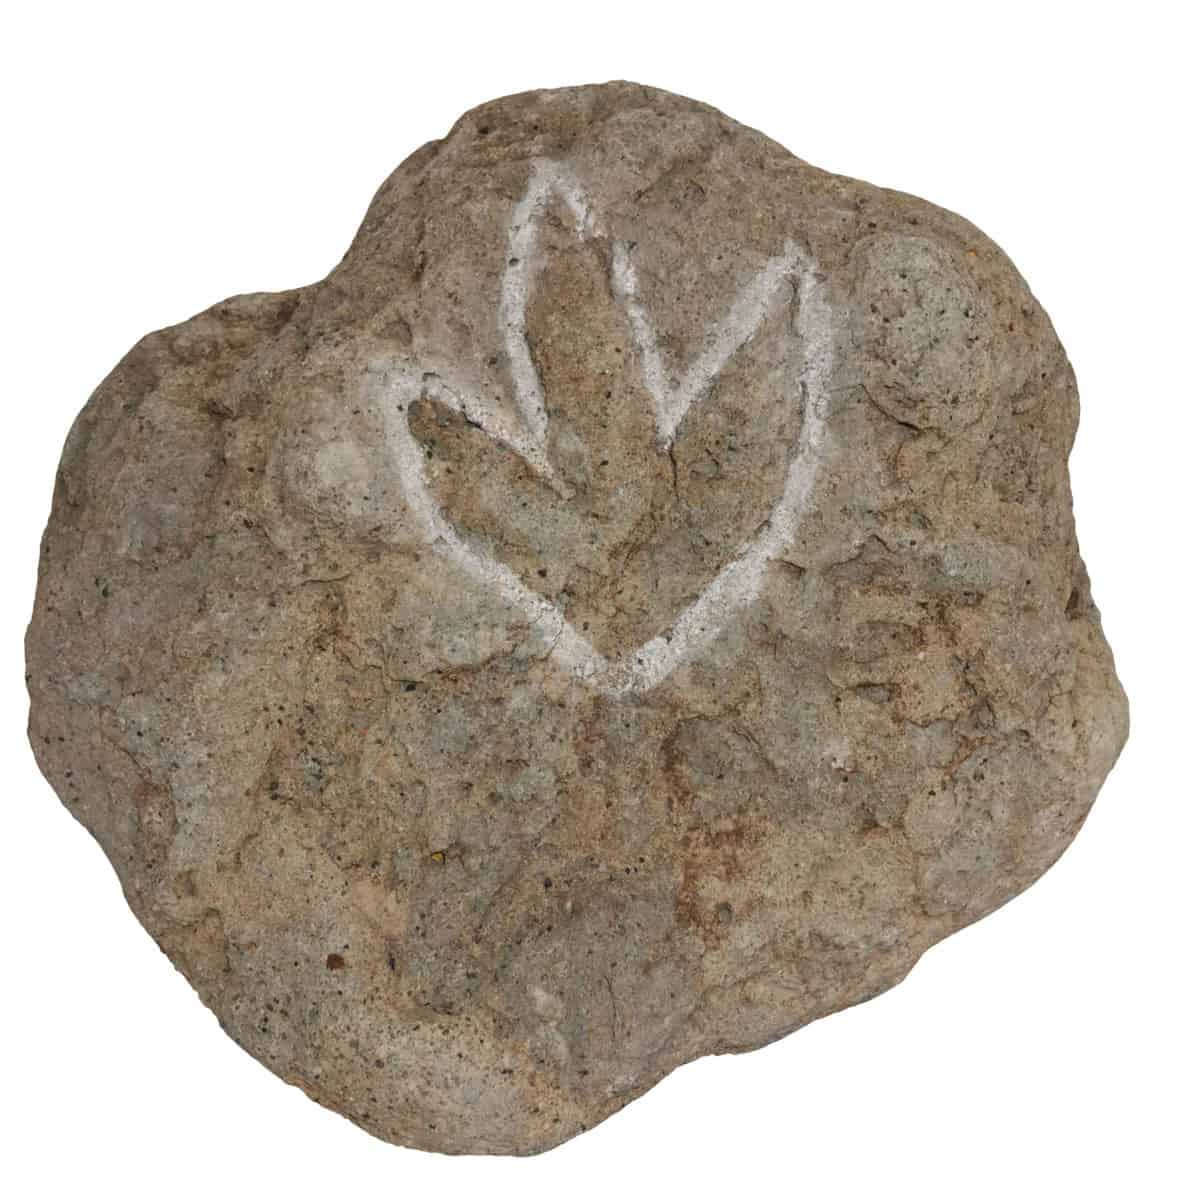 Rocks Resources IMG_20200507_095719 dinosaur footprint on display at Folkestone Museum